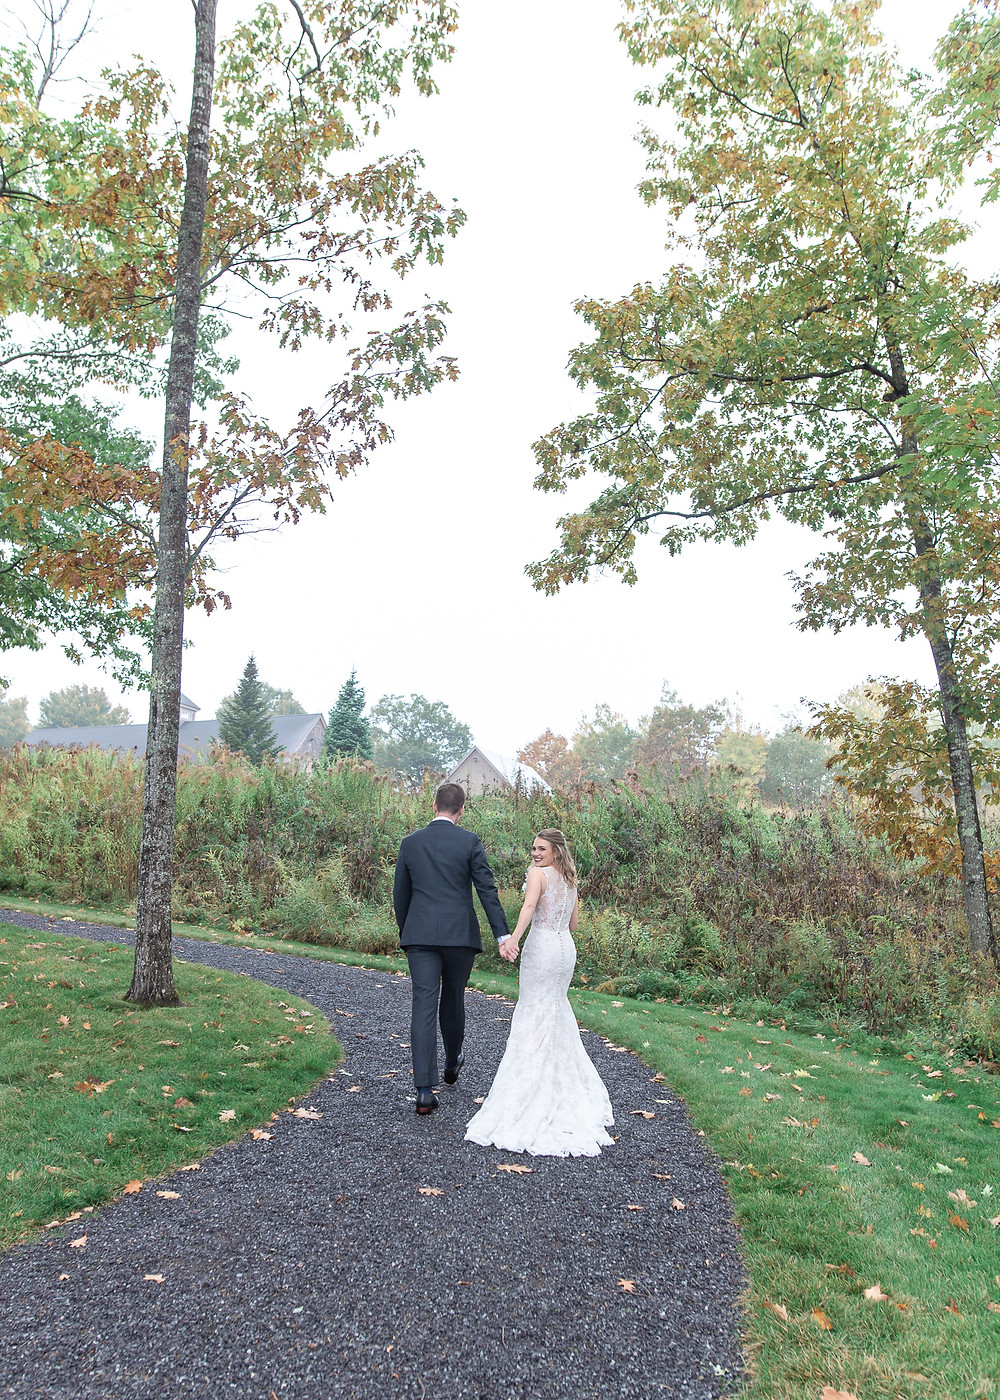 Maine's boutique wedding photographer